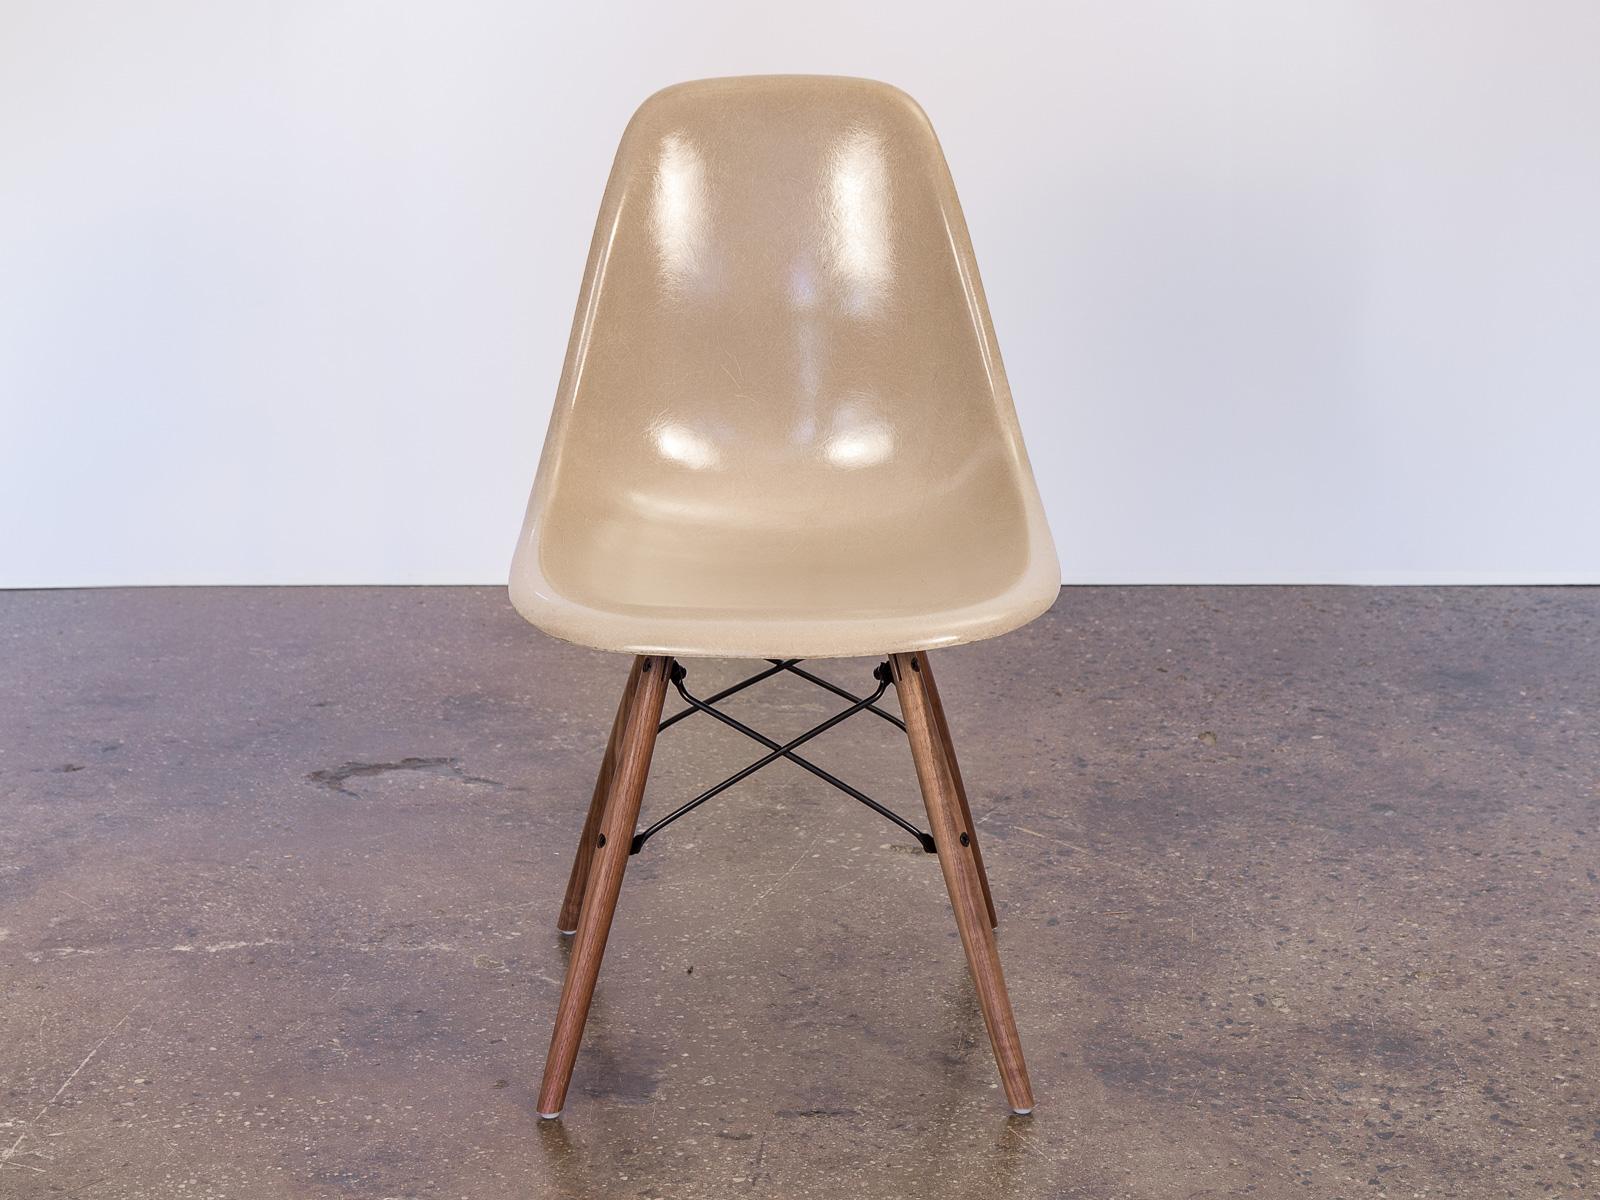 fiberglass shell chair queen design greige eames chairs on walnut dowel base oam